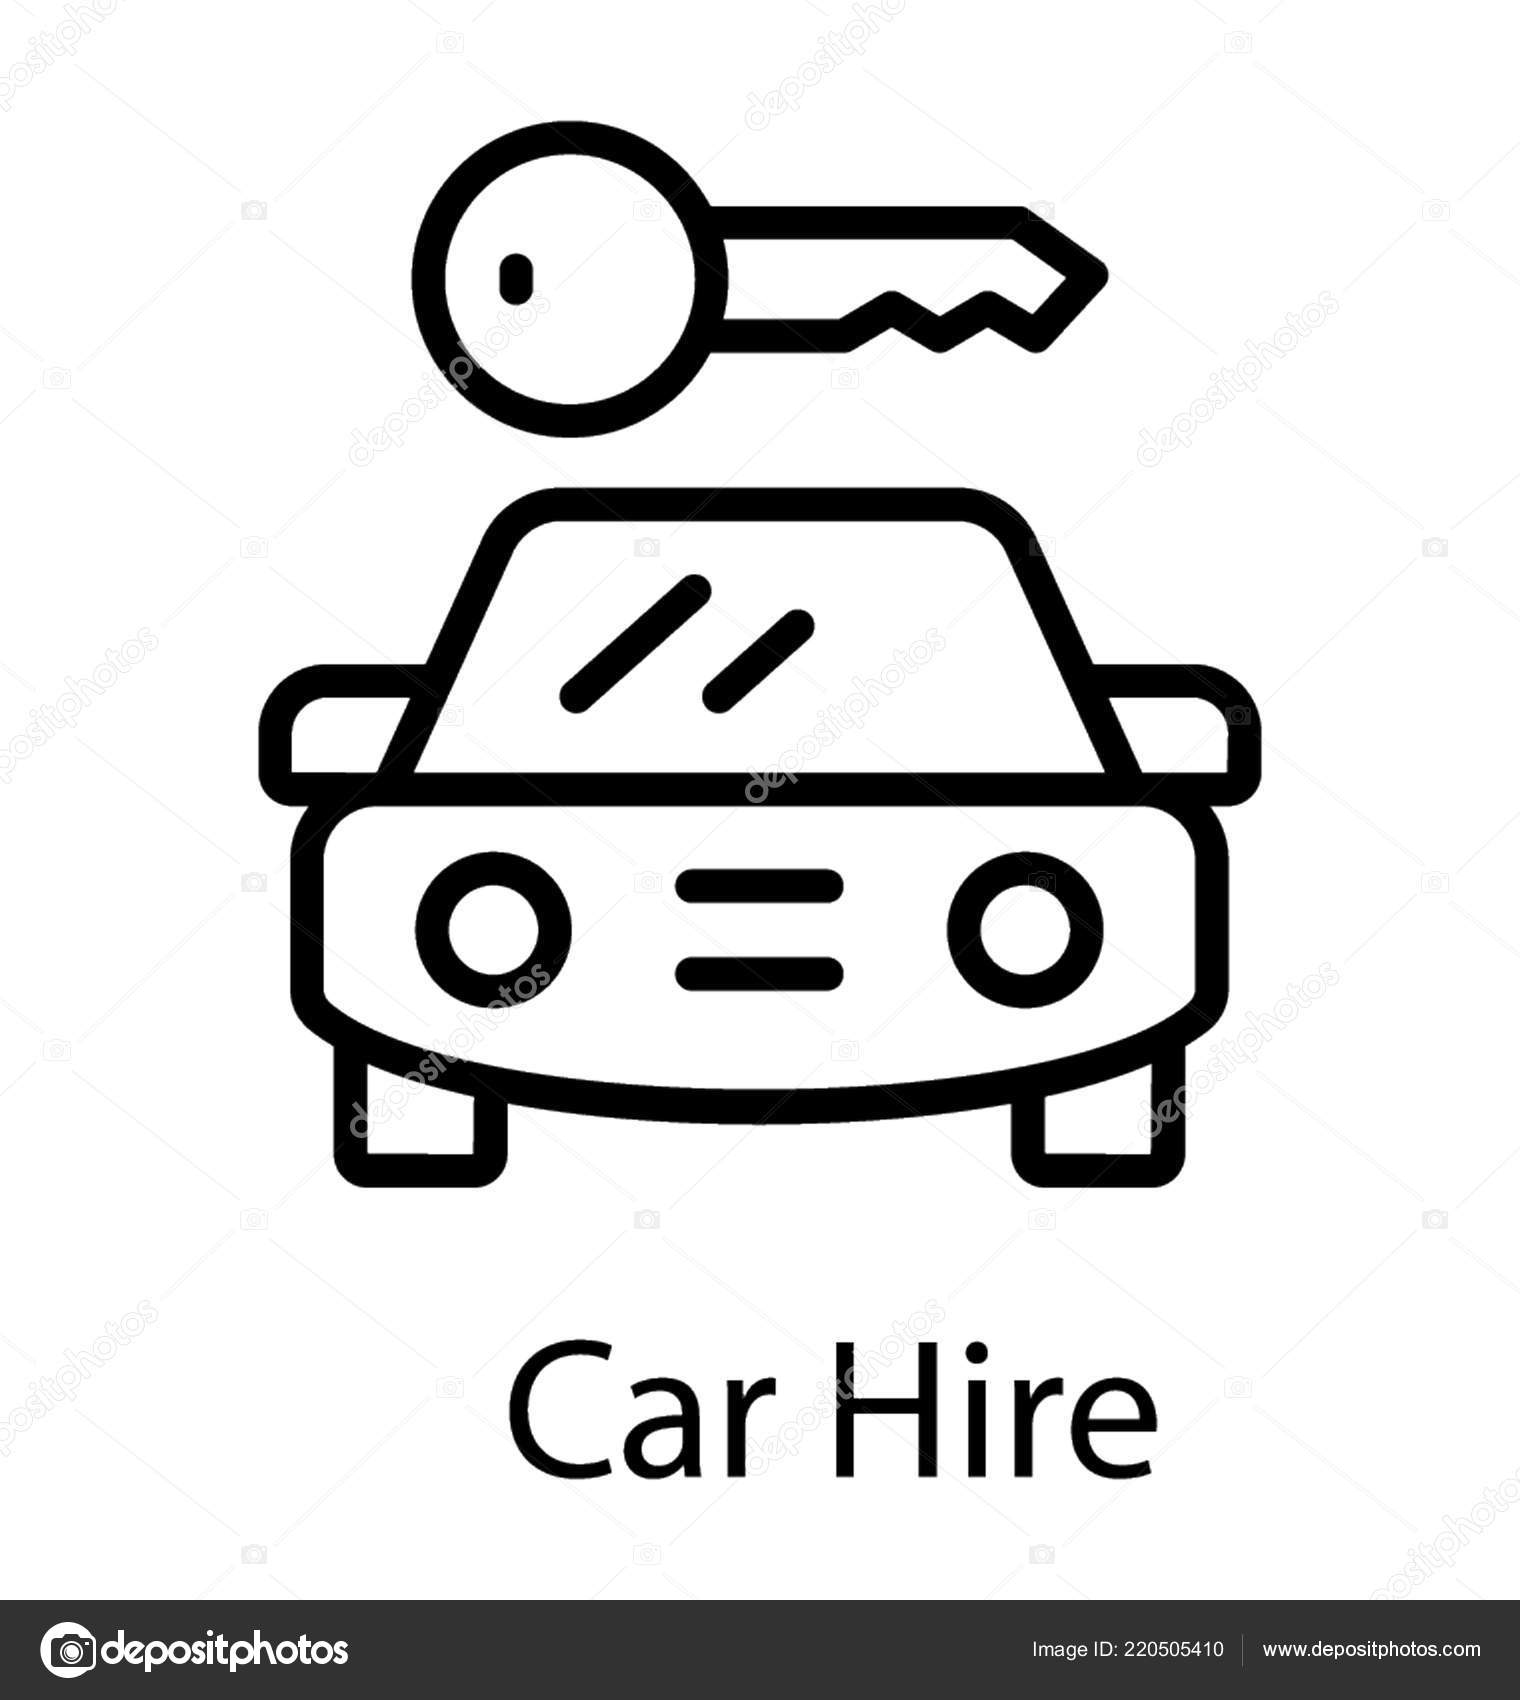 Car Hire Car Rental Icon Stock Vector C Prosymbols 220505410